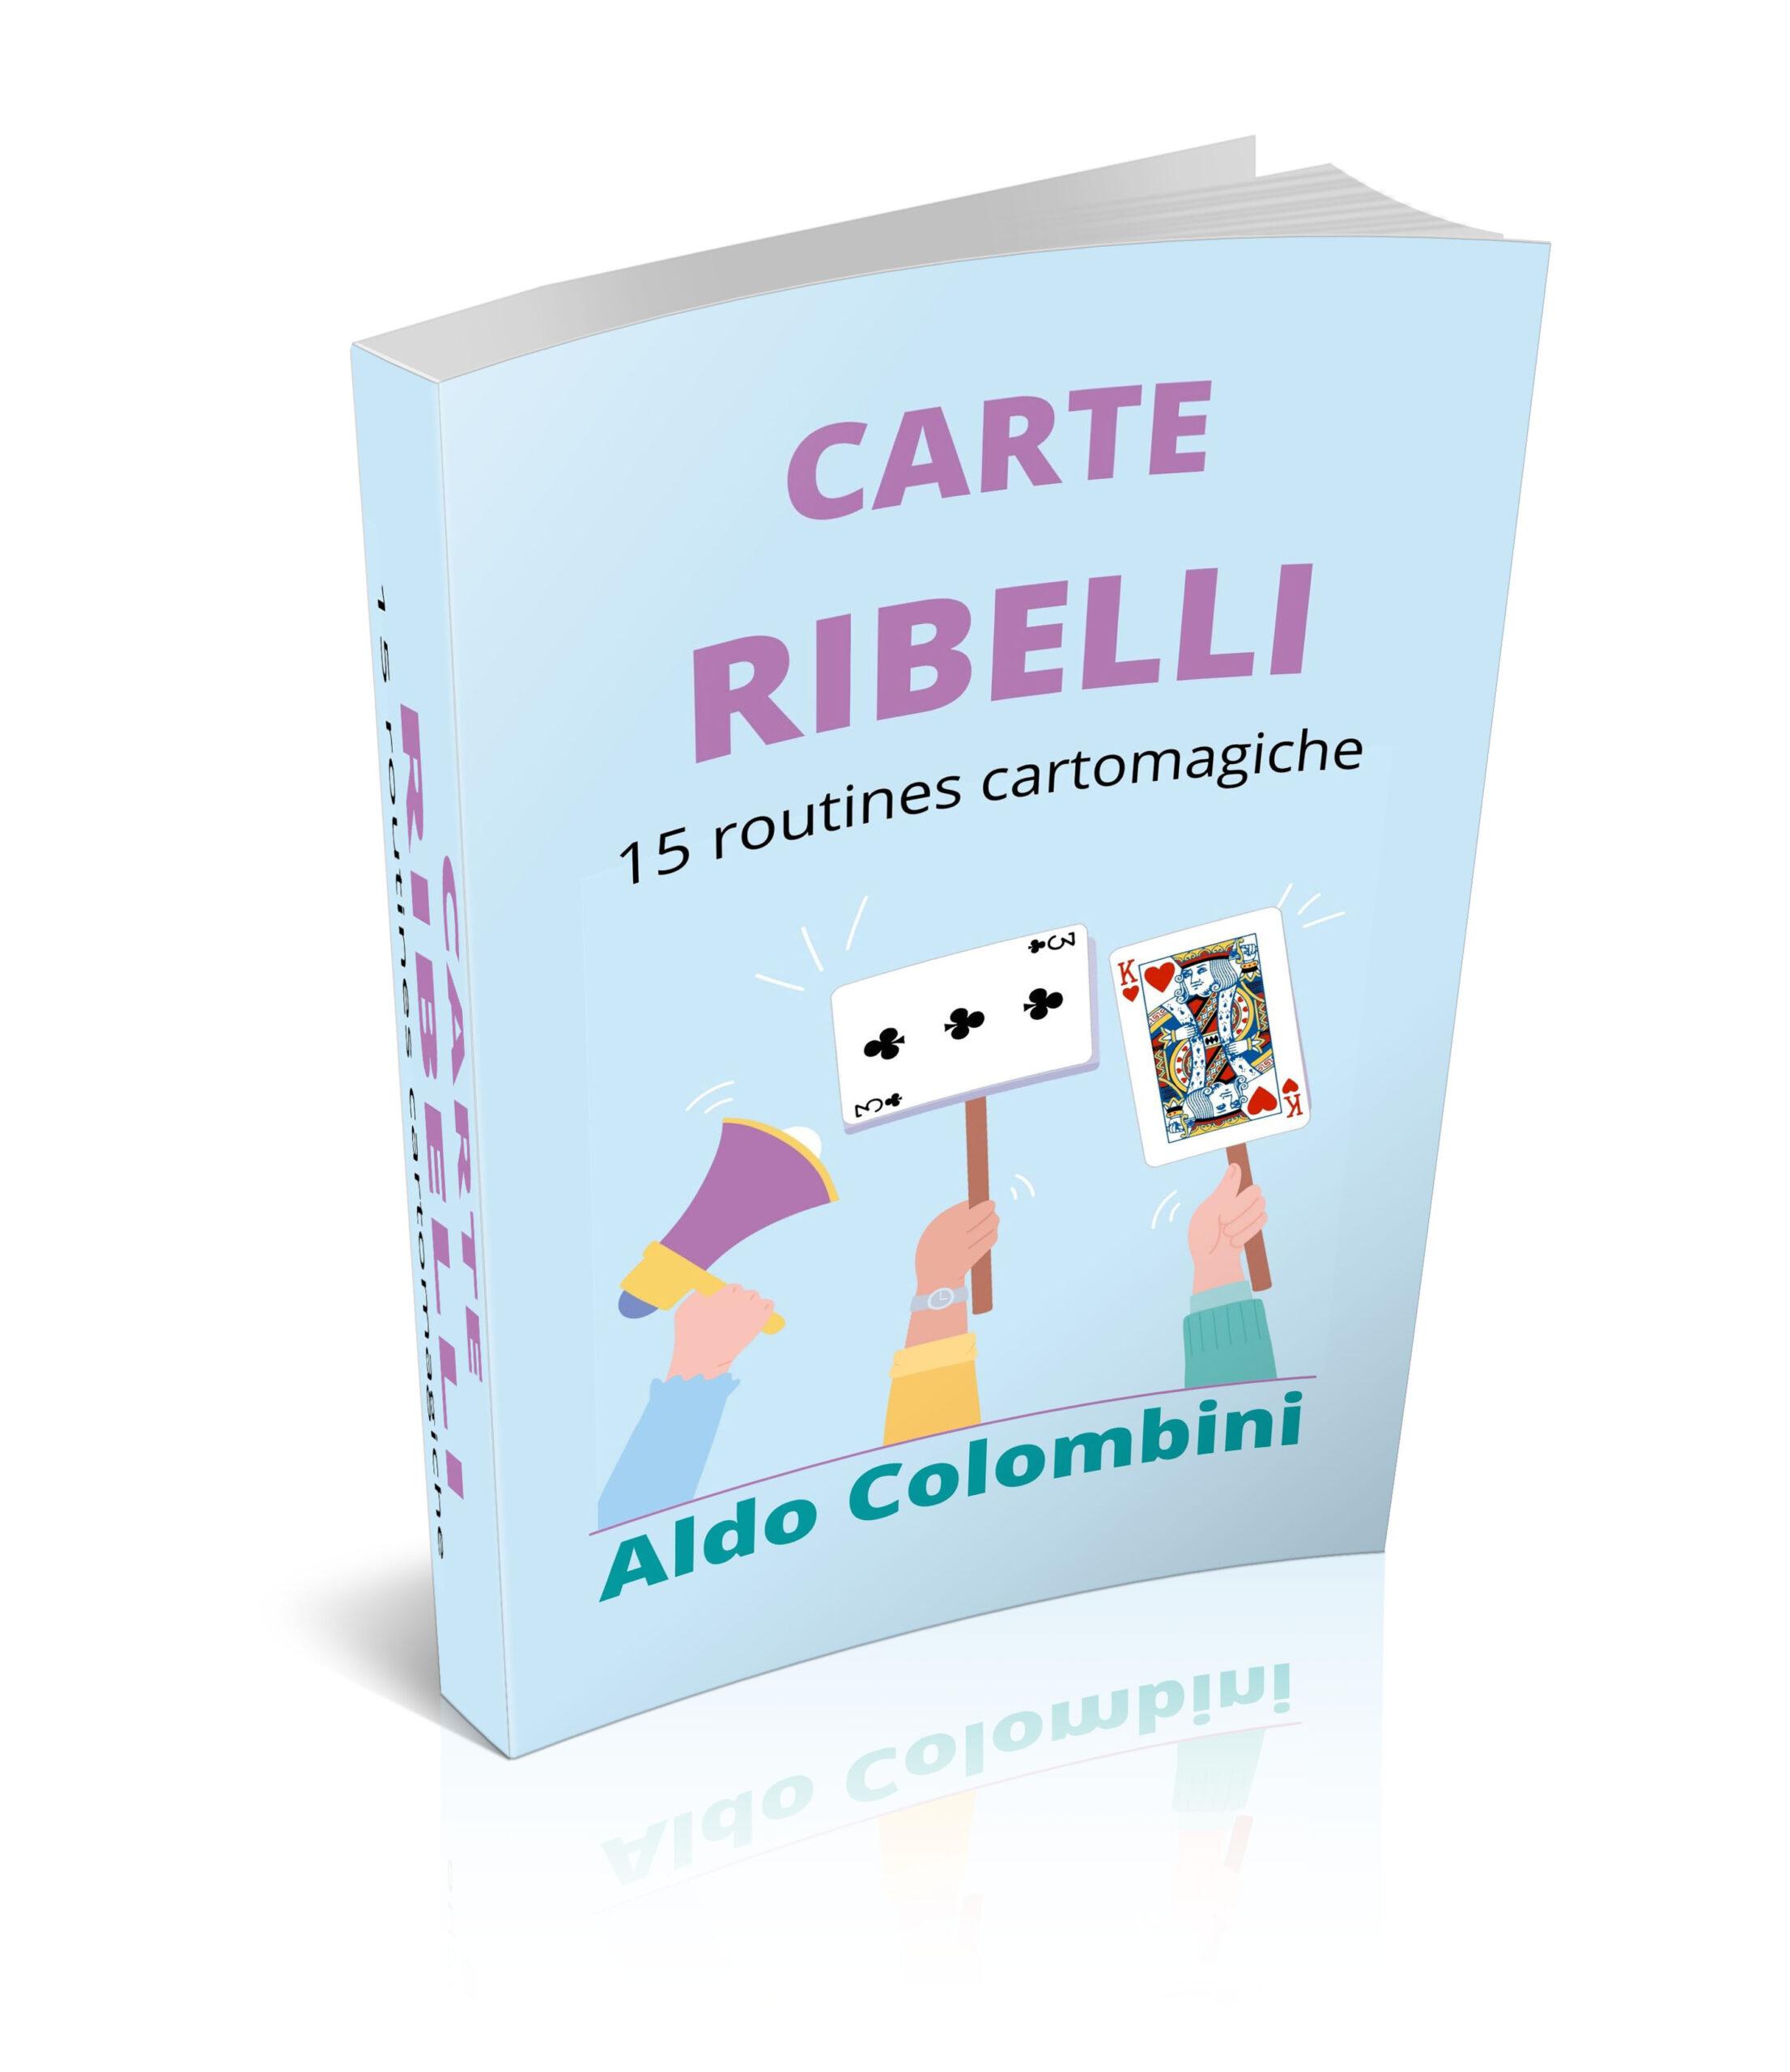 Carte Ribelli